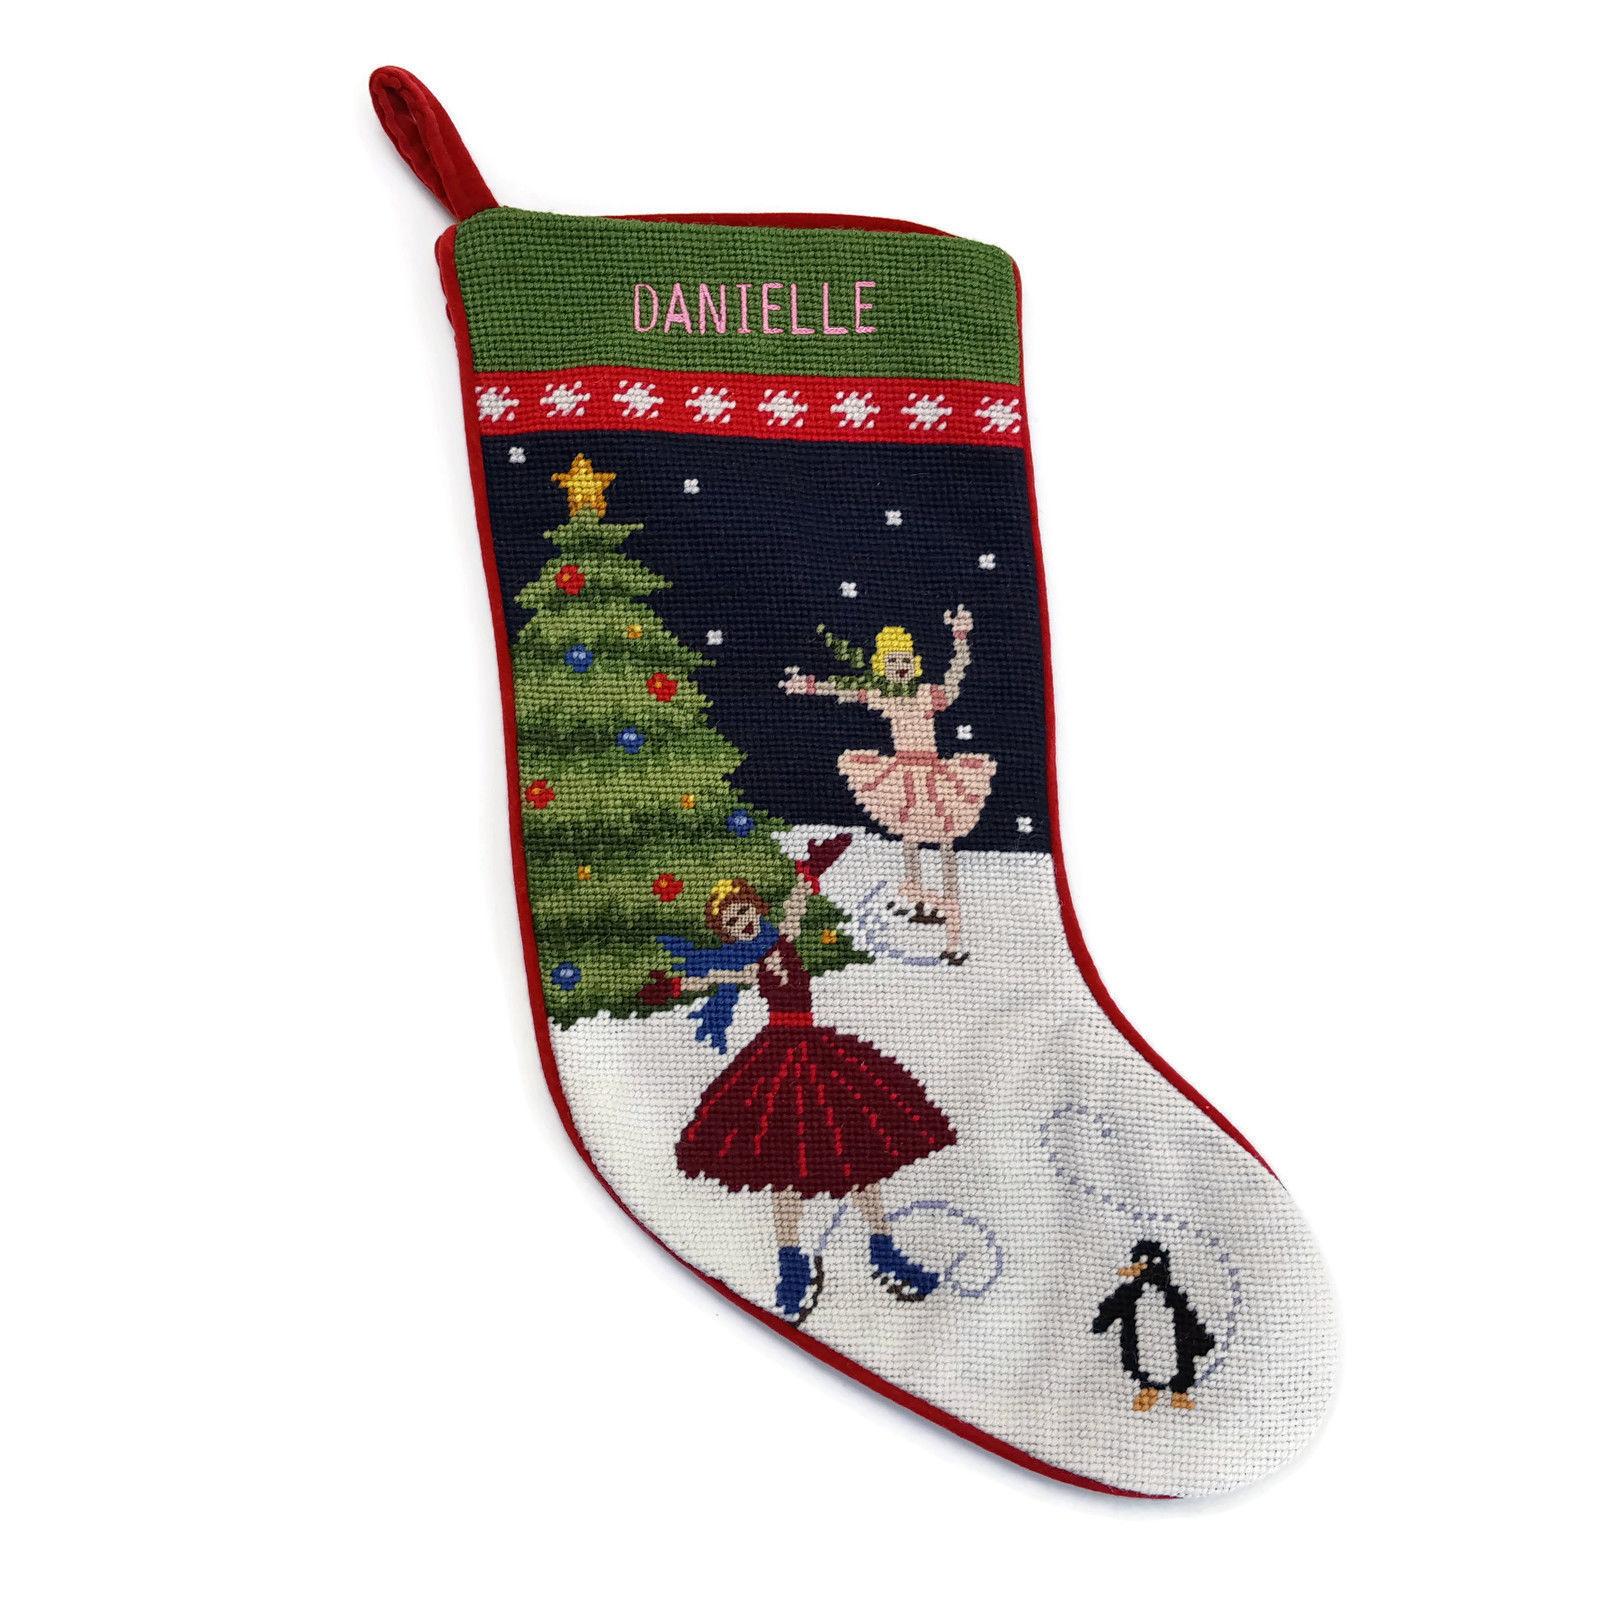 Lands End Needlepoint Christmas Stocking and 50 similar items